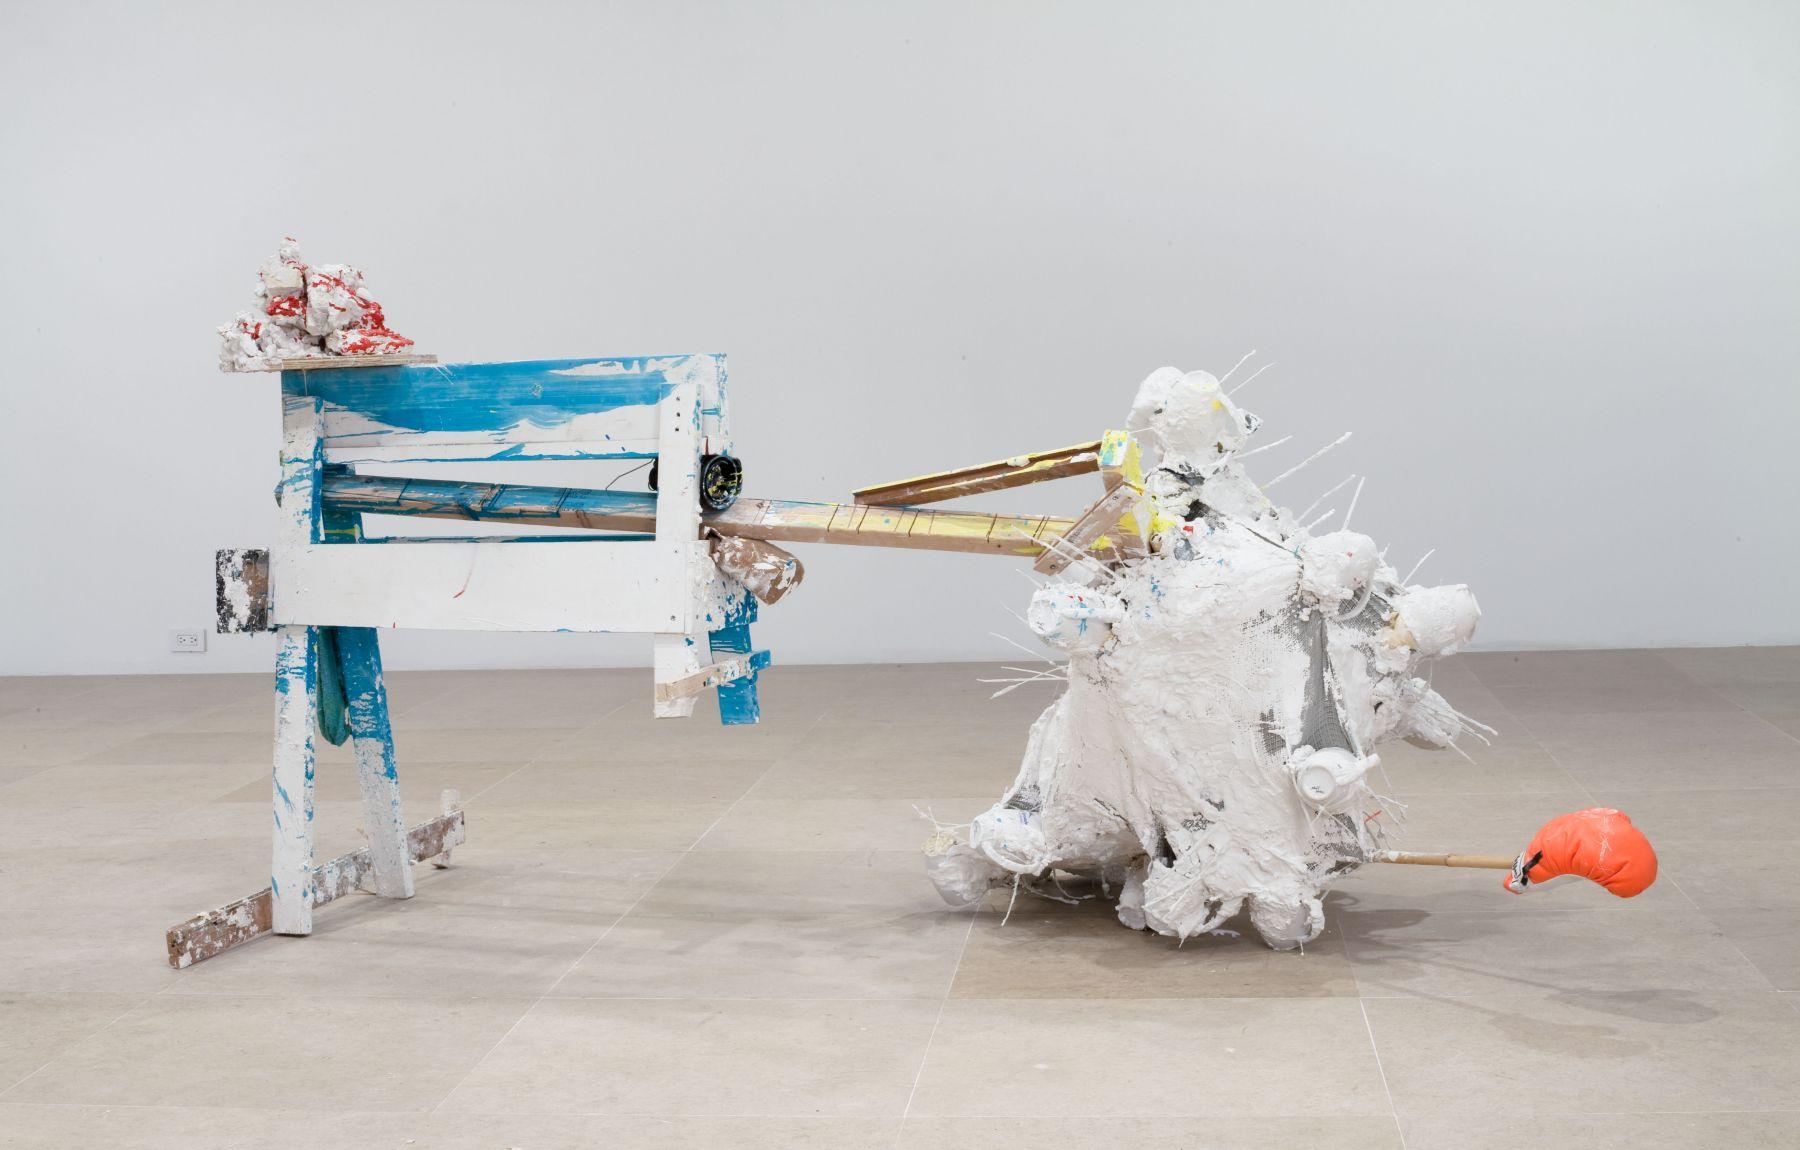 gelitin Untitled, 2010 Mixed media 47 x 48 x 98 inches 119.4 x 121.9 x 248.9 cm